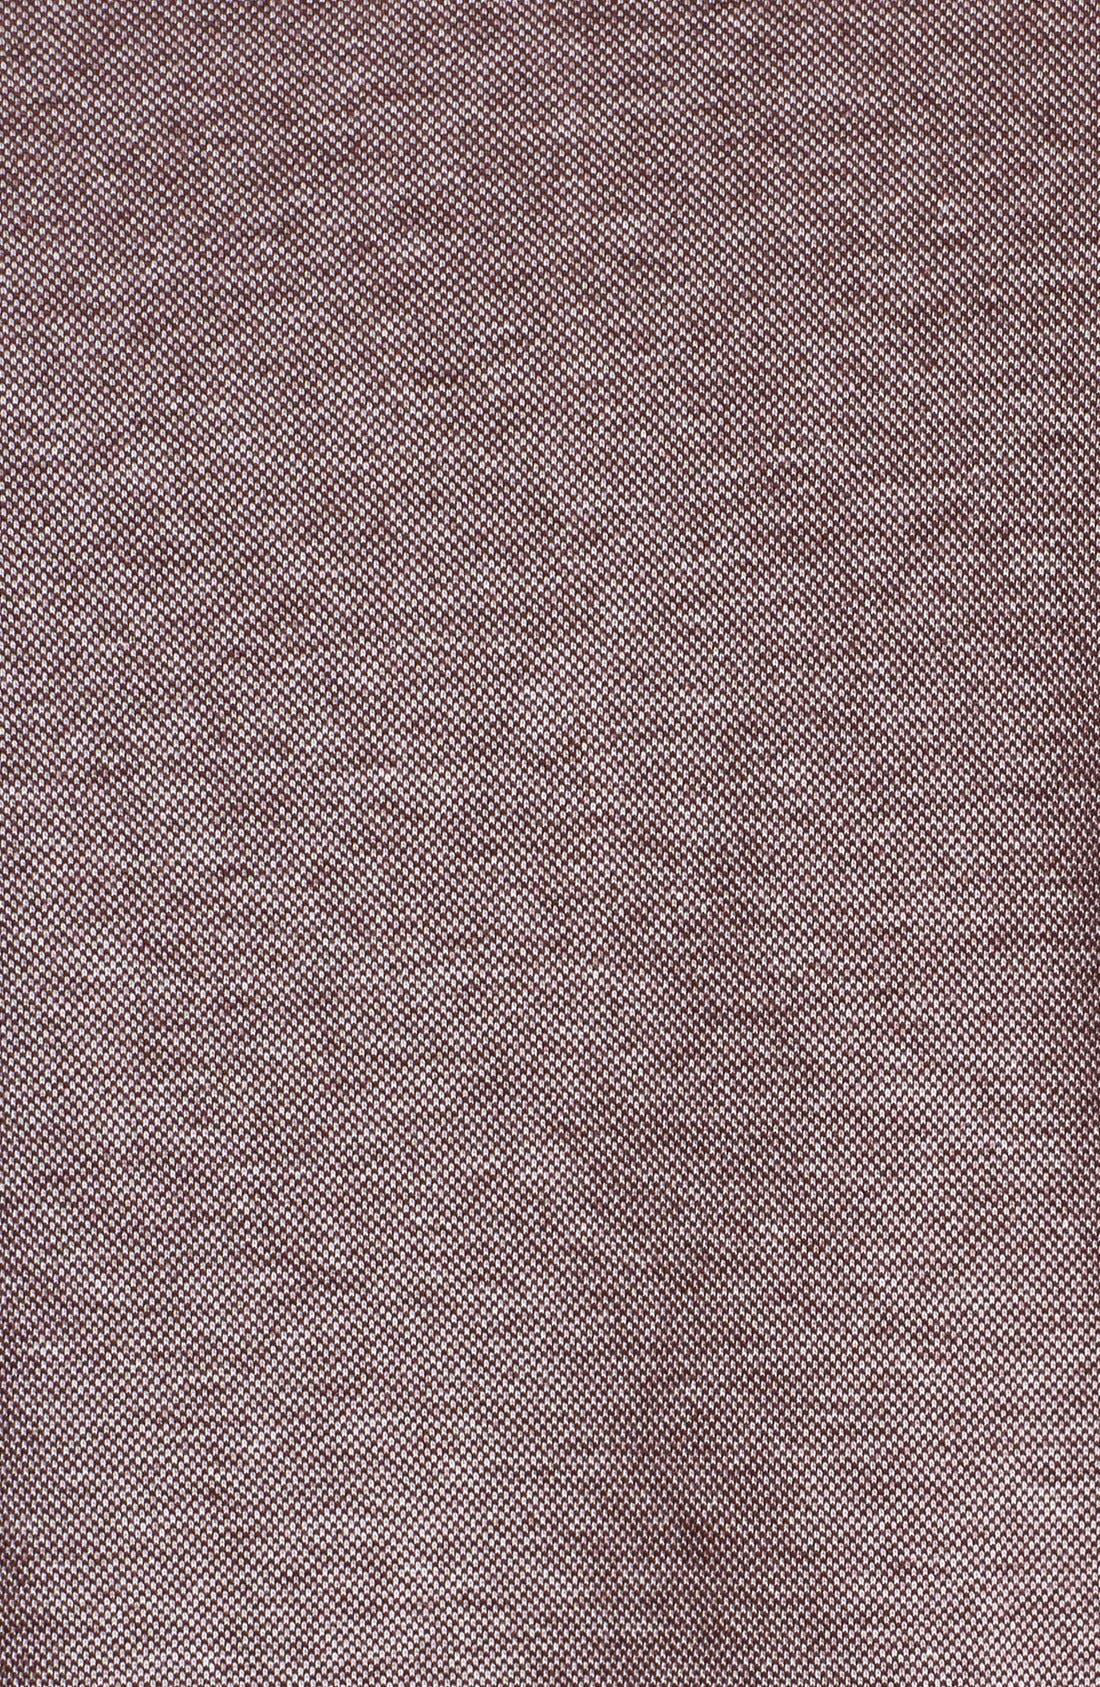 Alternate Image 3  - BOSS HUGO BOSS 'Piceno' Mock Neck Sweatshirt